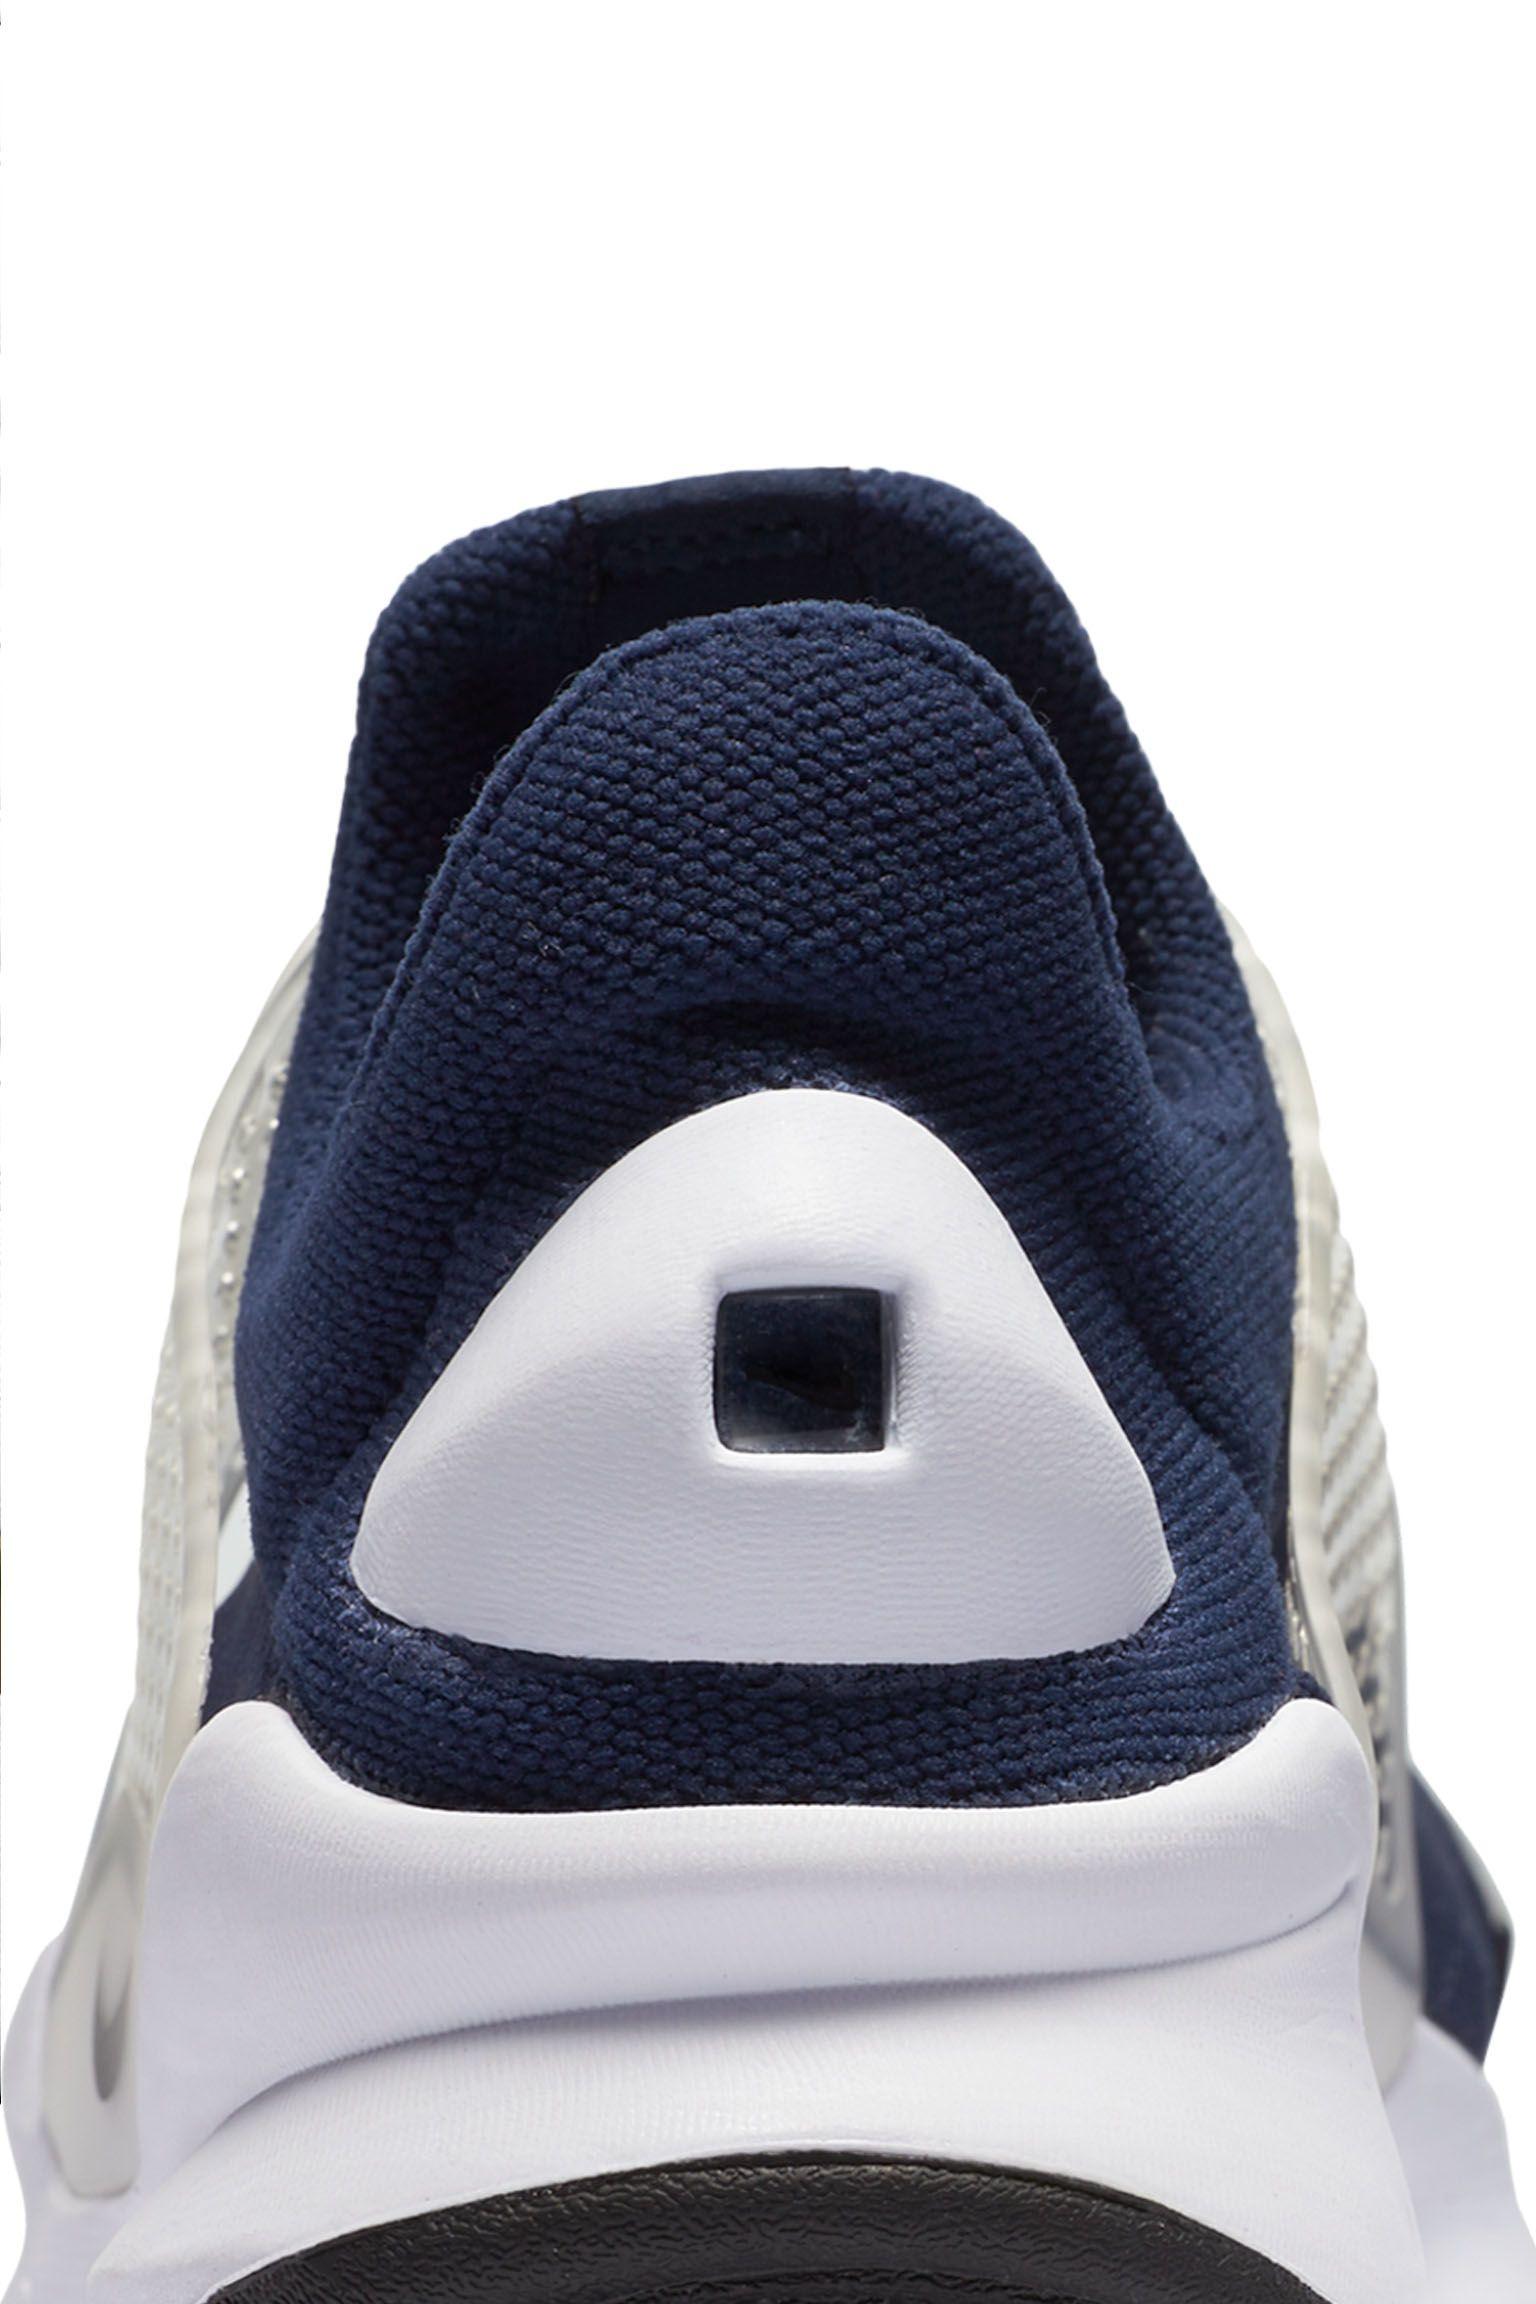 Nike Sock Dart 'Midnight Navy'